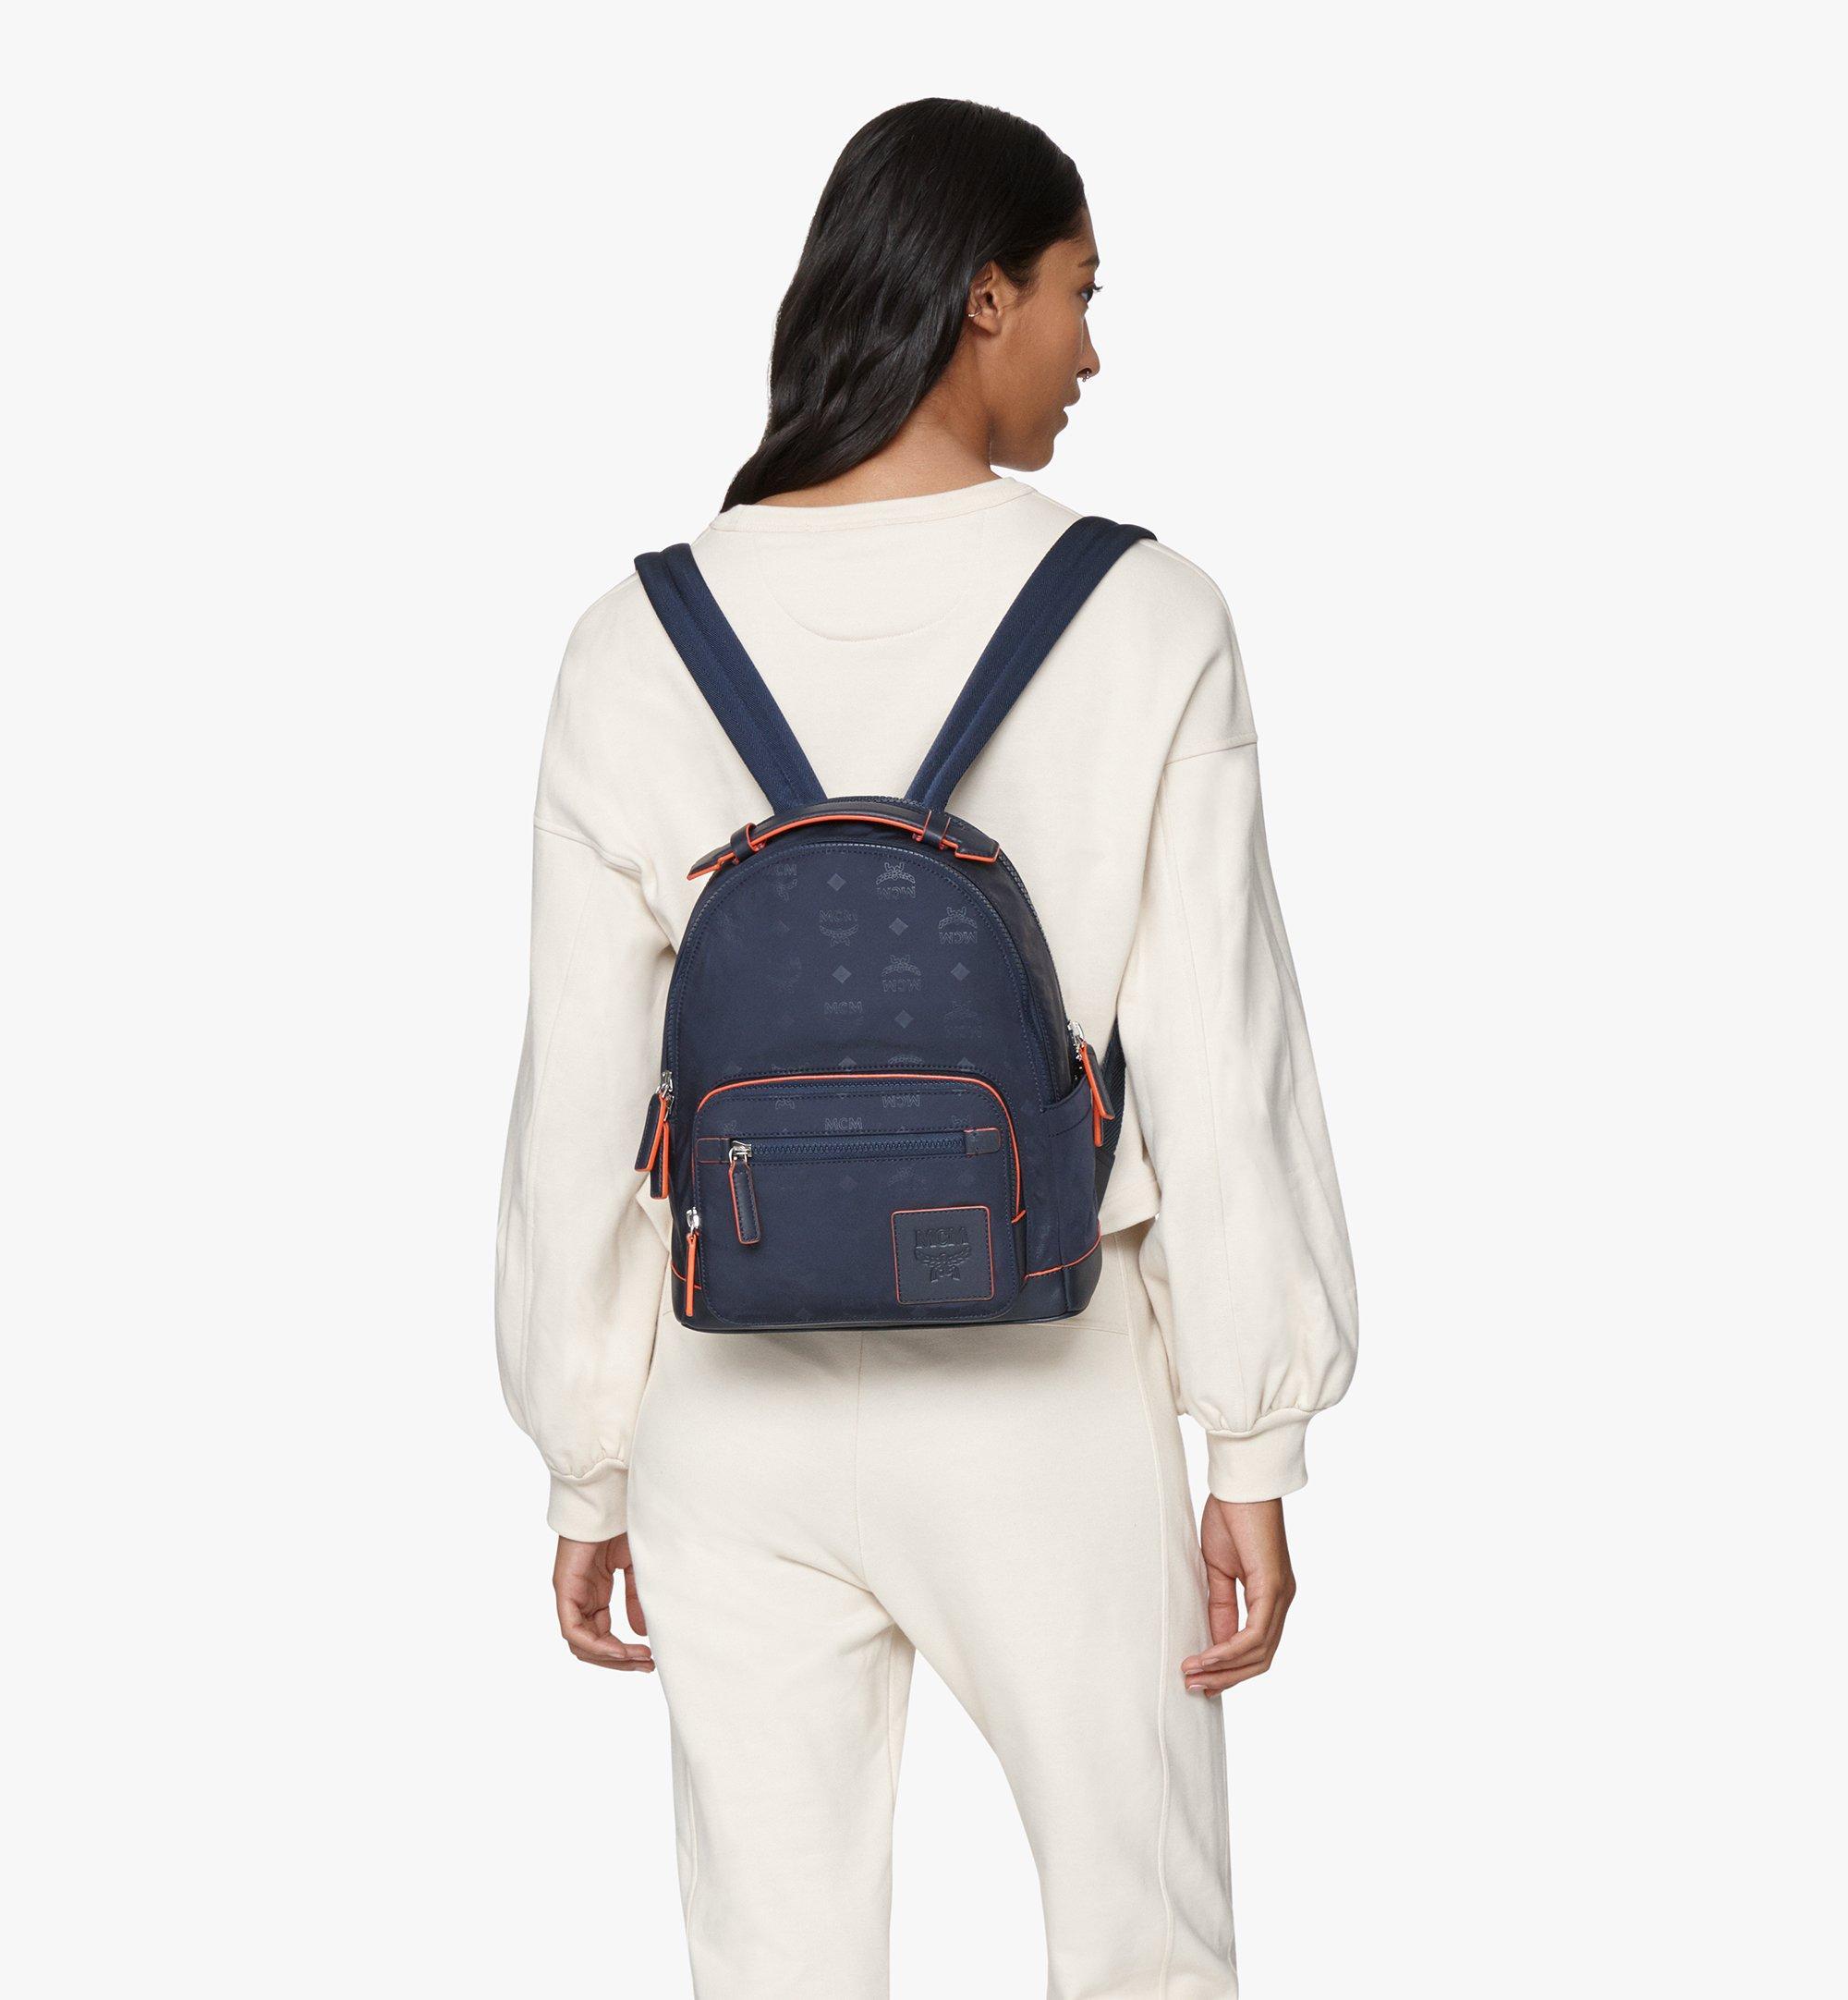 MCM Stark Backpack in Monogram Nylon Navy MMKASVE25VA001 Alternate View 2